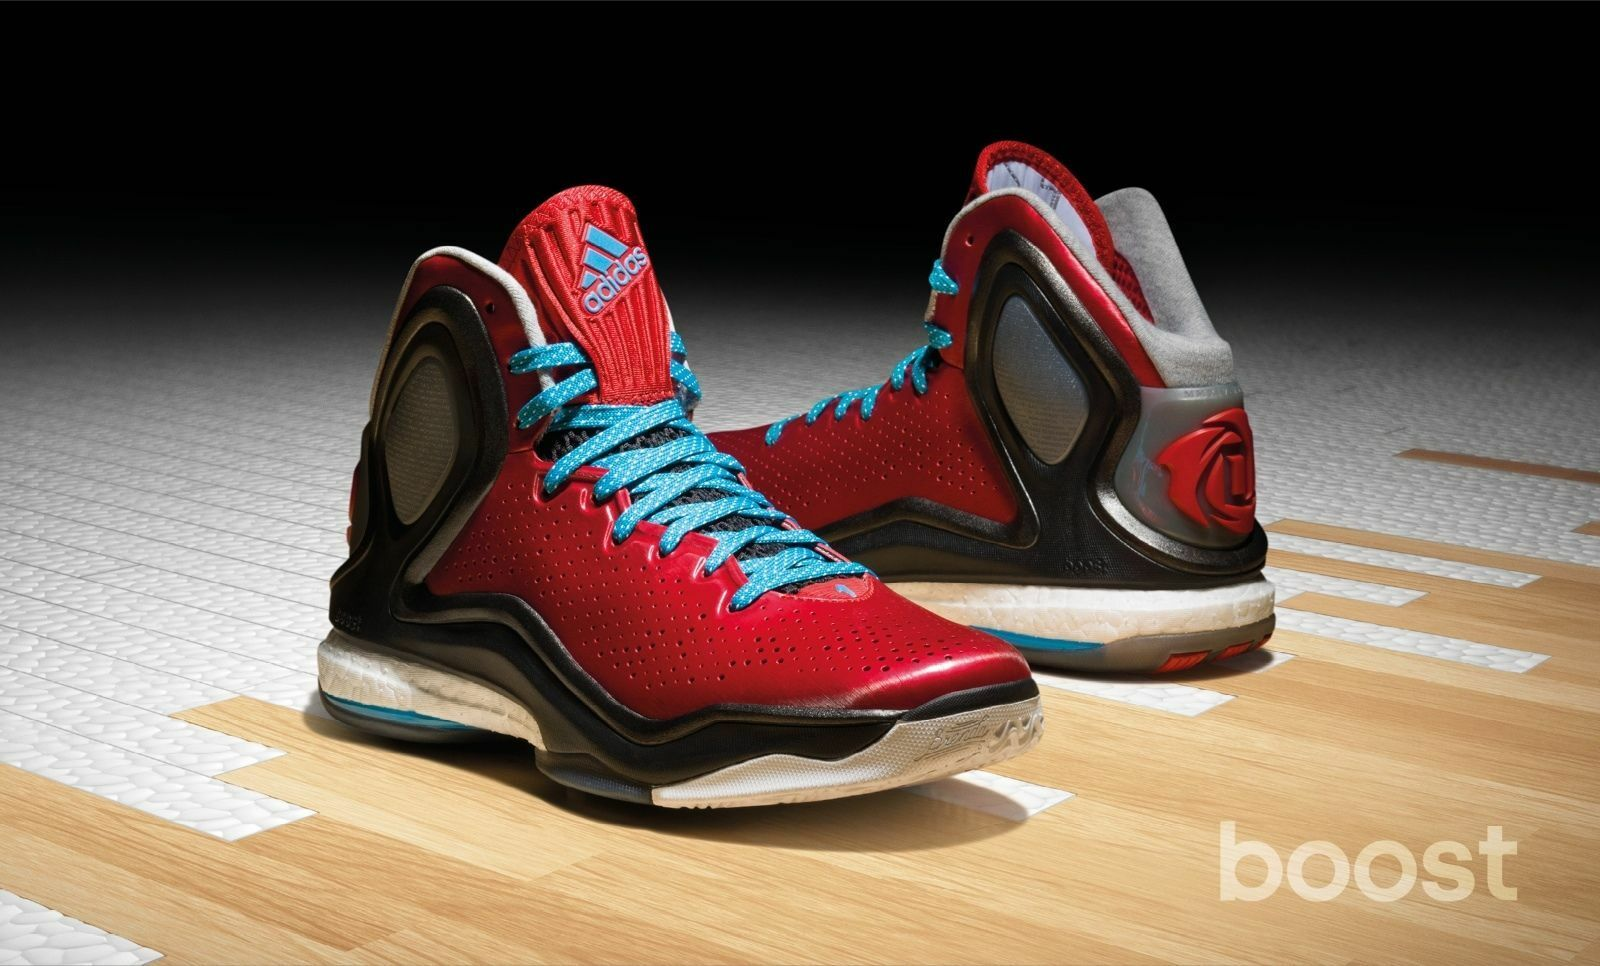 Adidas D Rose 5 Boost C75593 Size US 12 - Derrick Rose